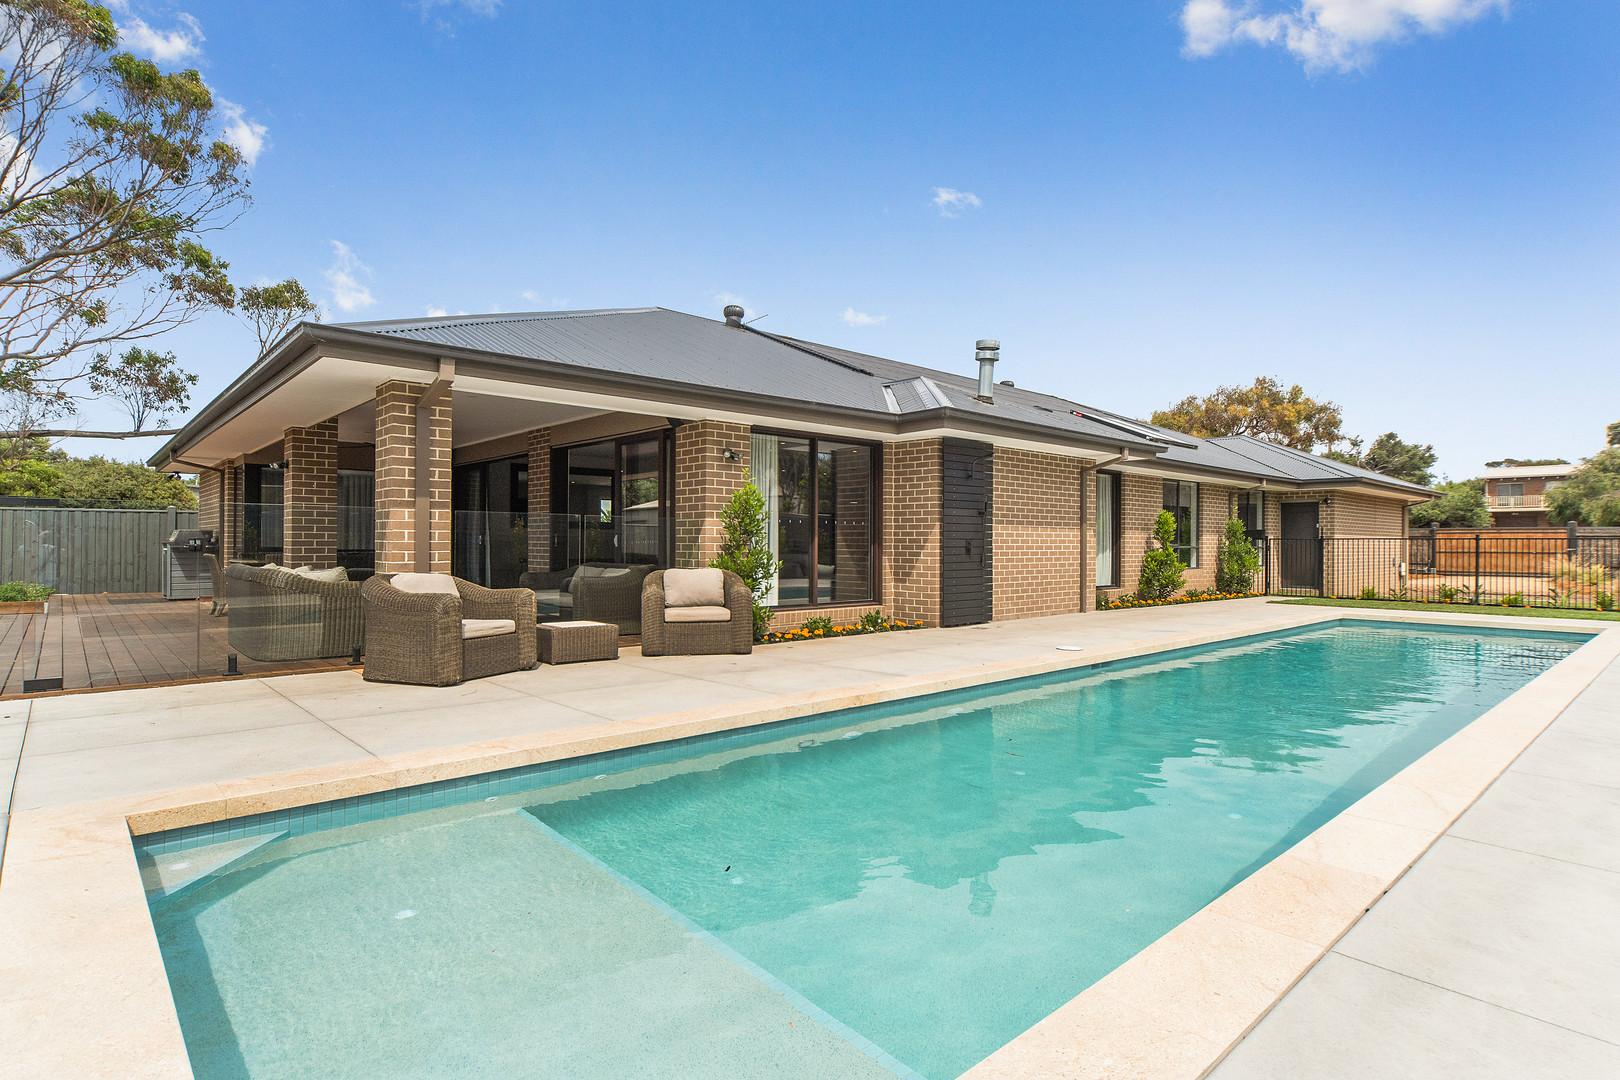 Sparkling solar heated pool